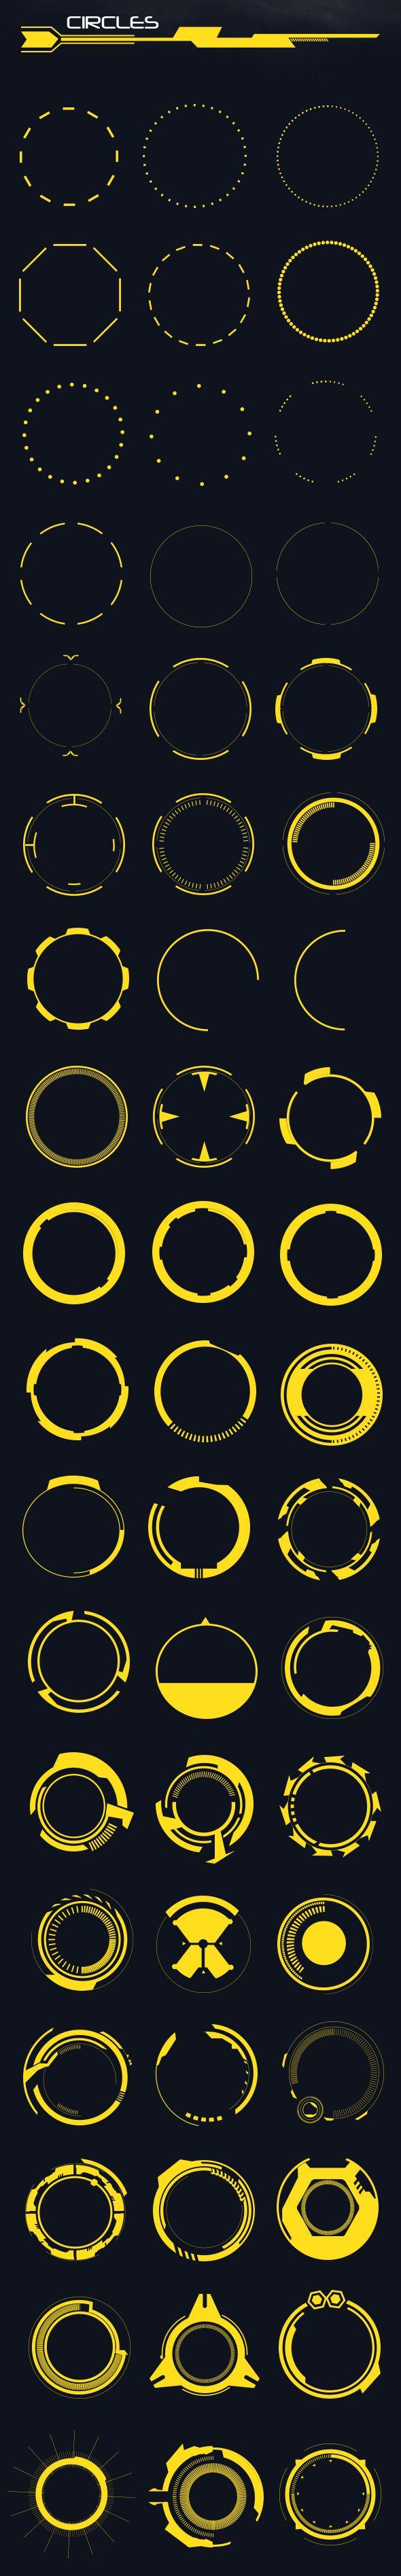 60 Hi-Tech Circles (Custom Shapes)